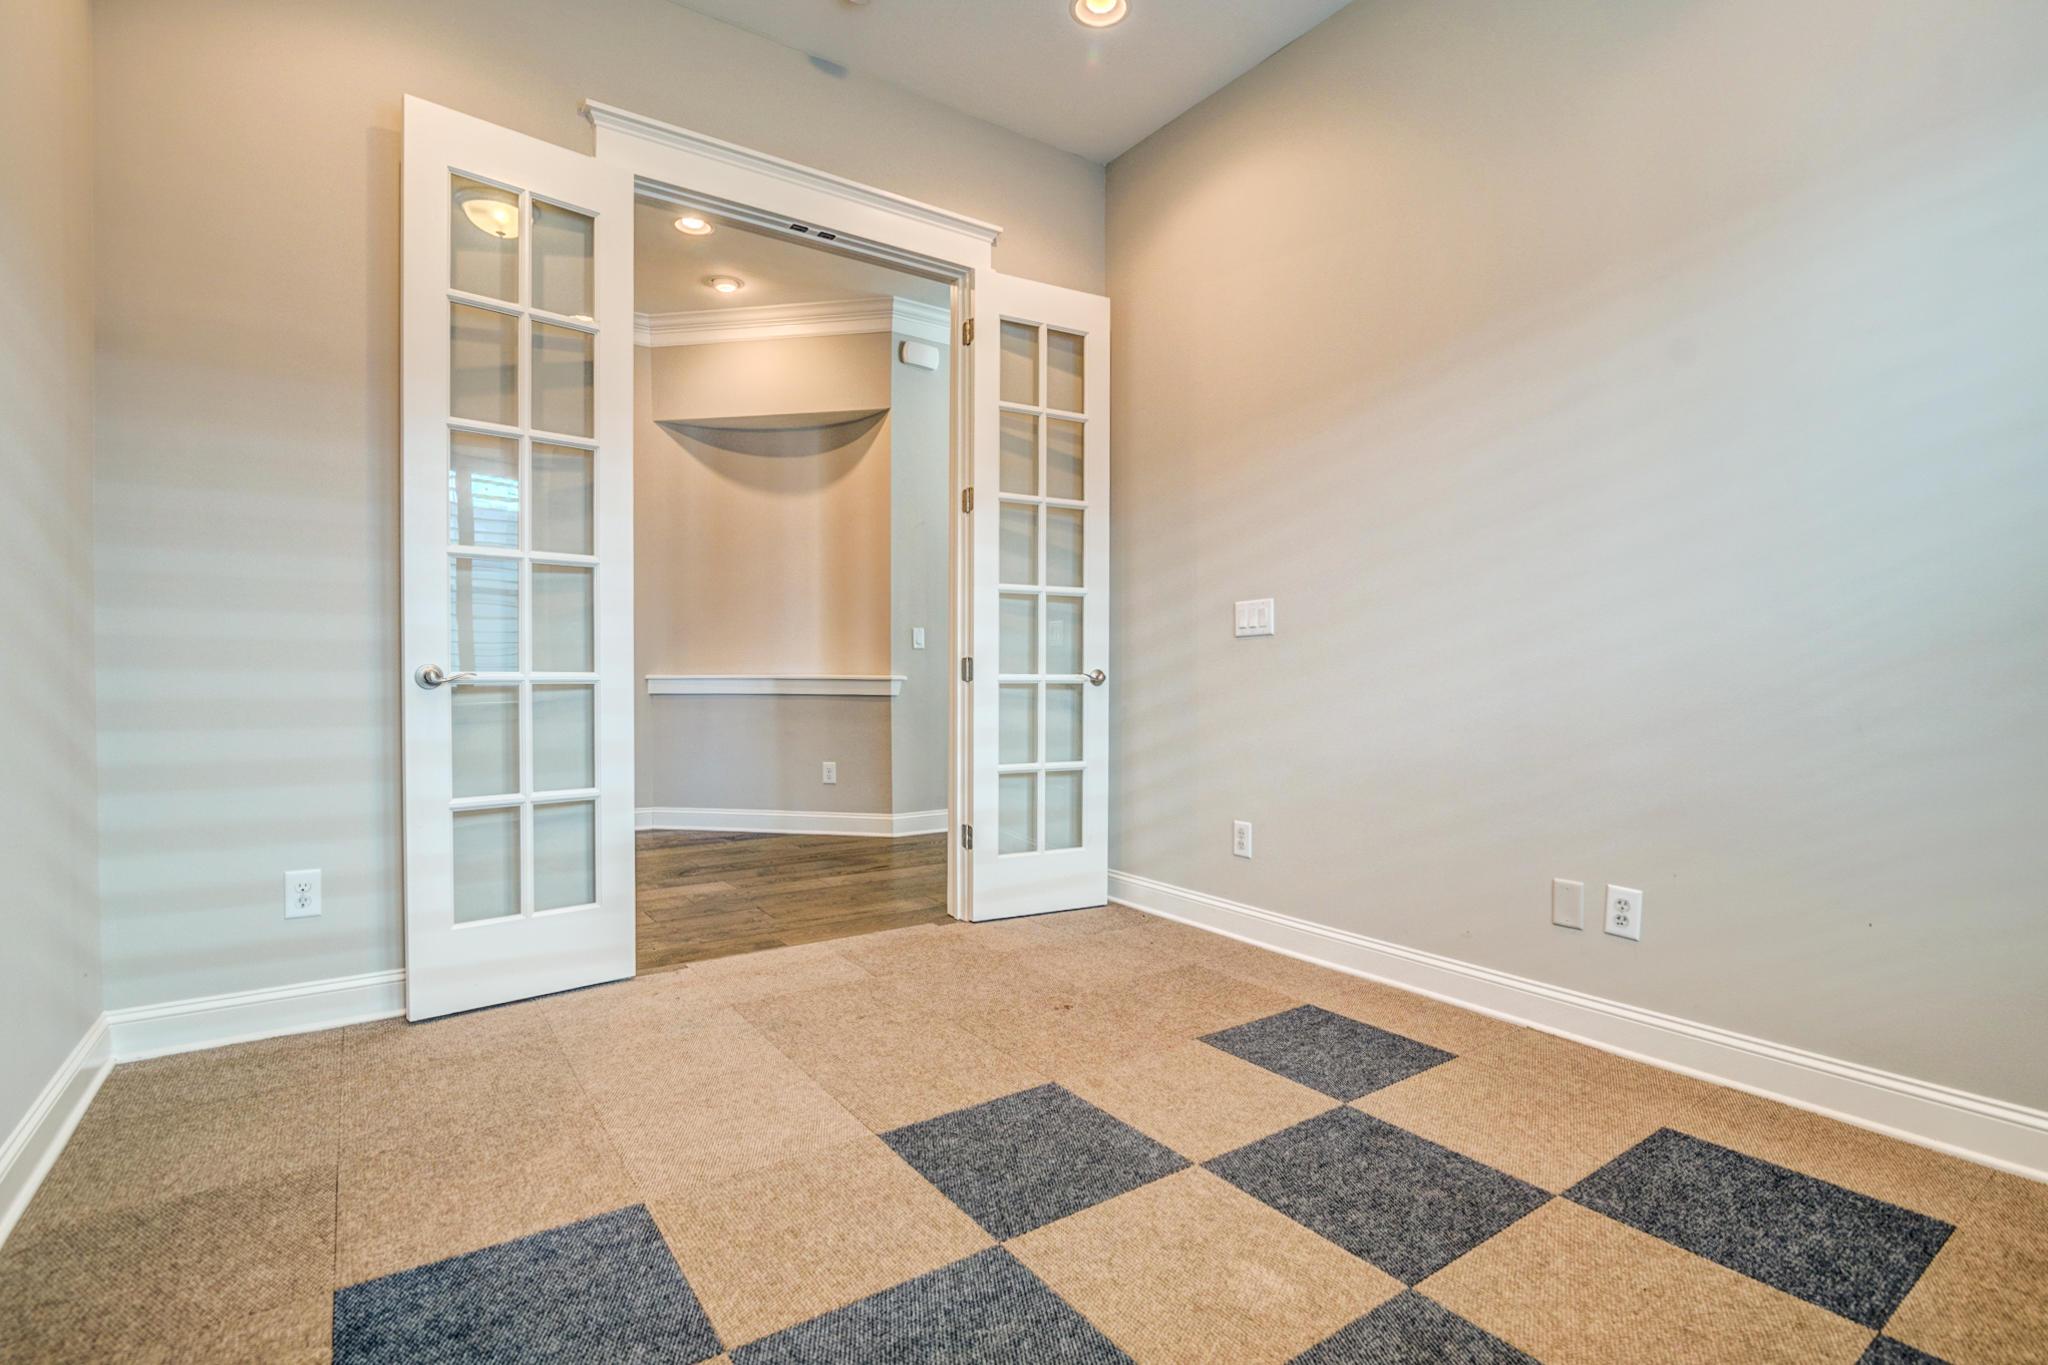 Carolina Park Homes For Sale - 3687 Spindrift, Mount Pleasant, SC - 1